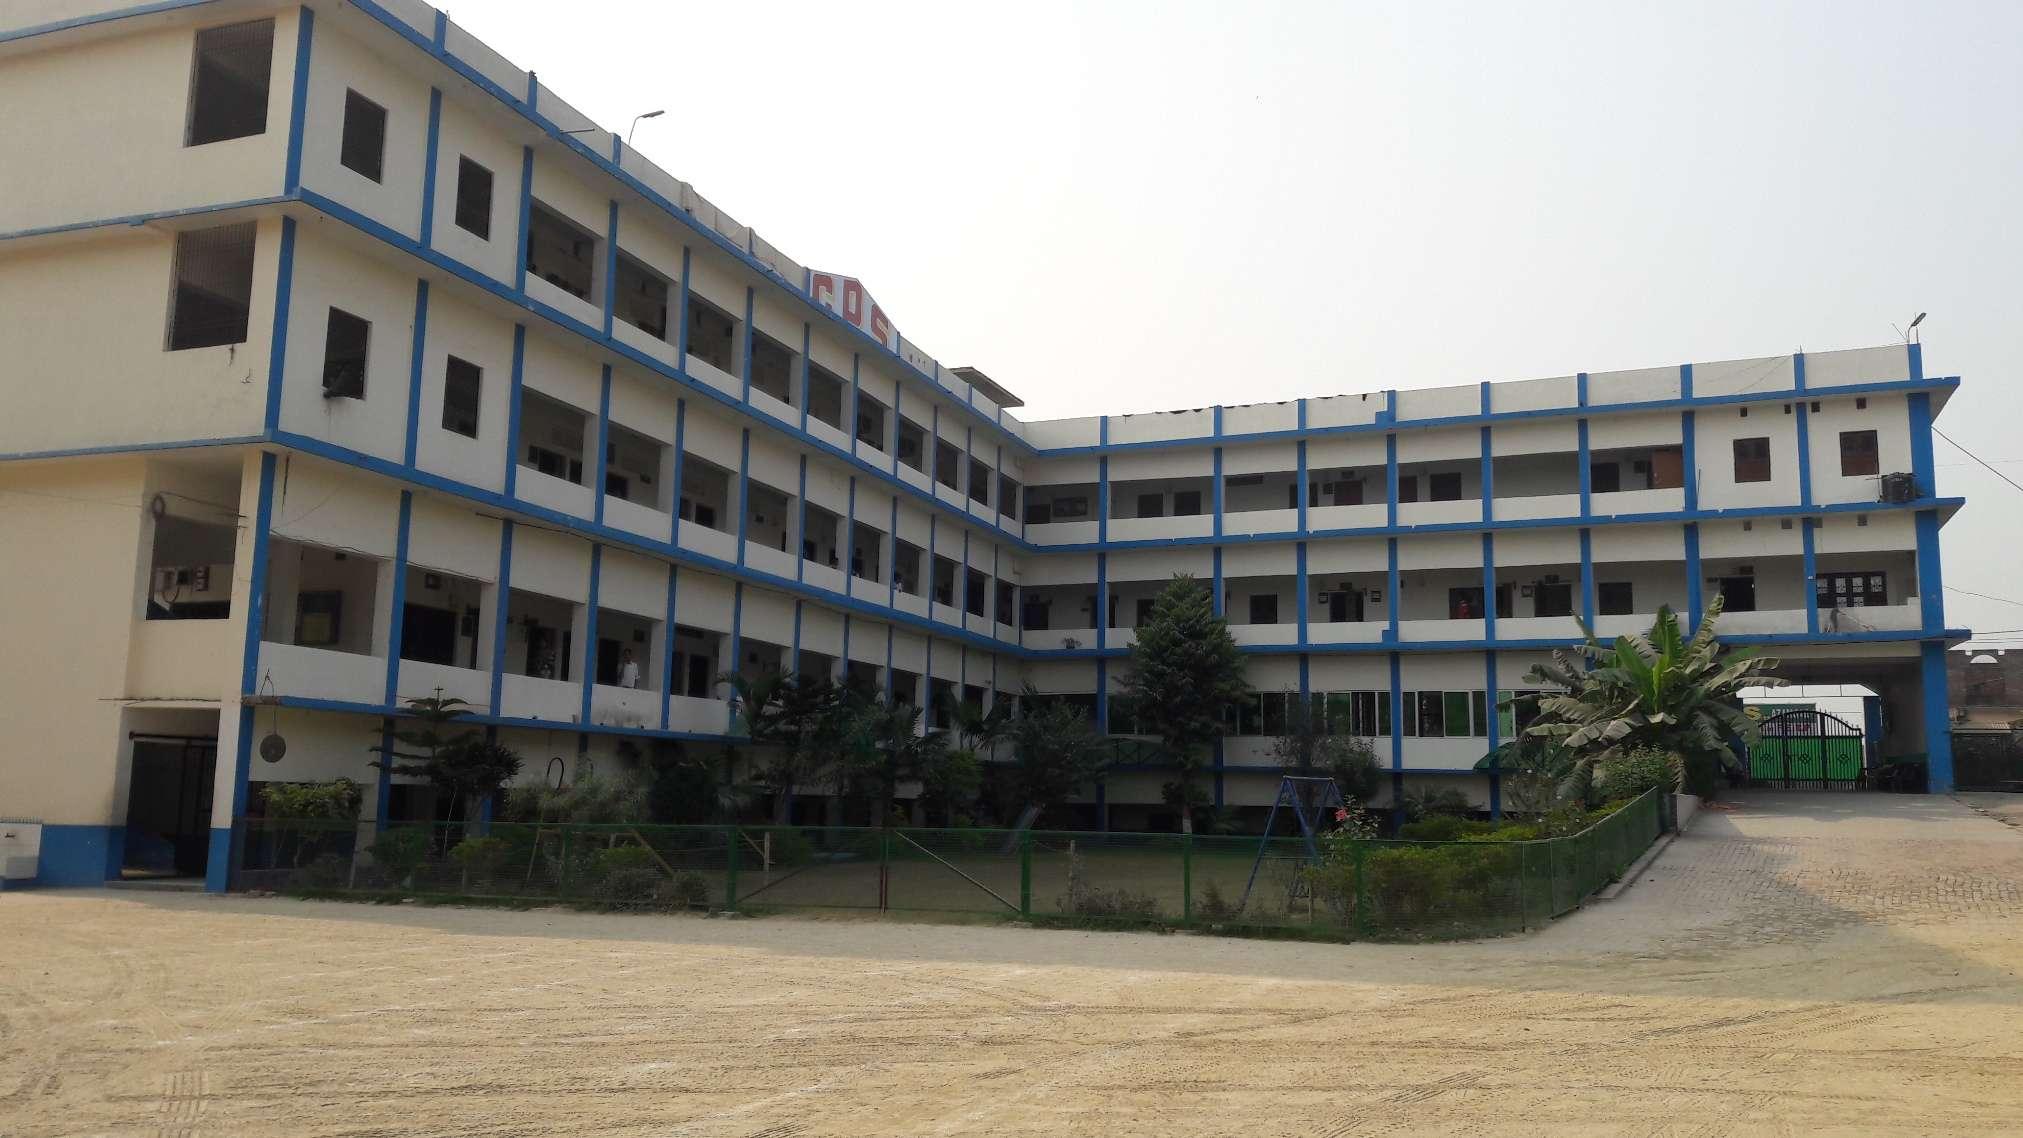 CENTRAL PUBLIC SCHOOL JAFARPUR NEAR RTO OFFICE AZAMGARH UTTAR PRADESH 2130633